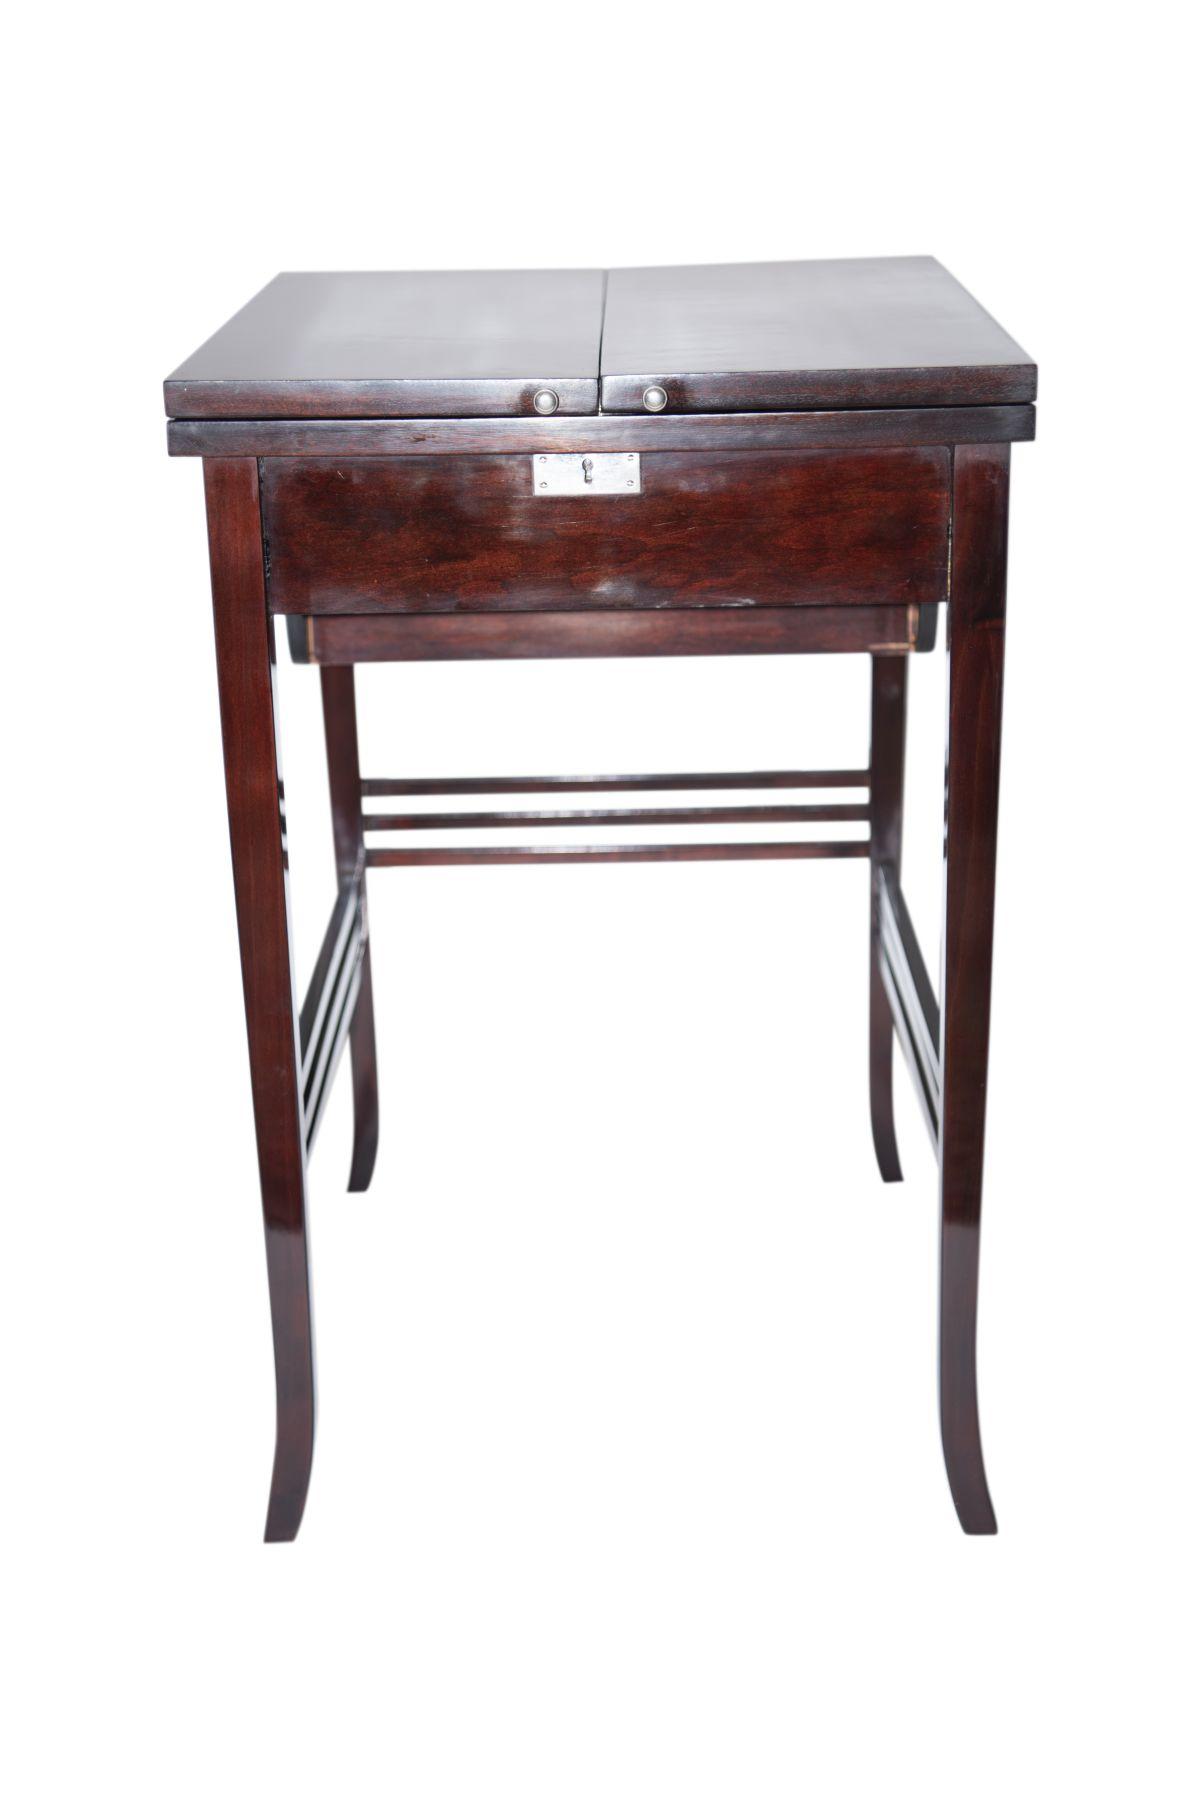 #166 Lady Secretary Art Nouveau | Damensekretär Jugendstil Image